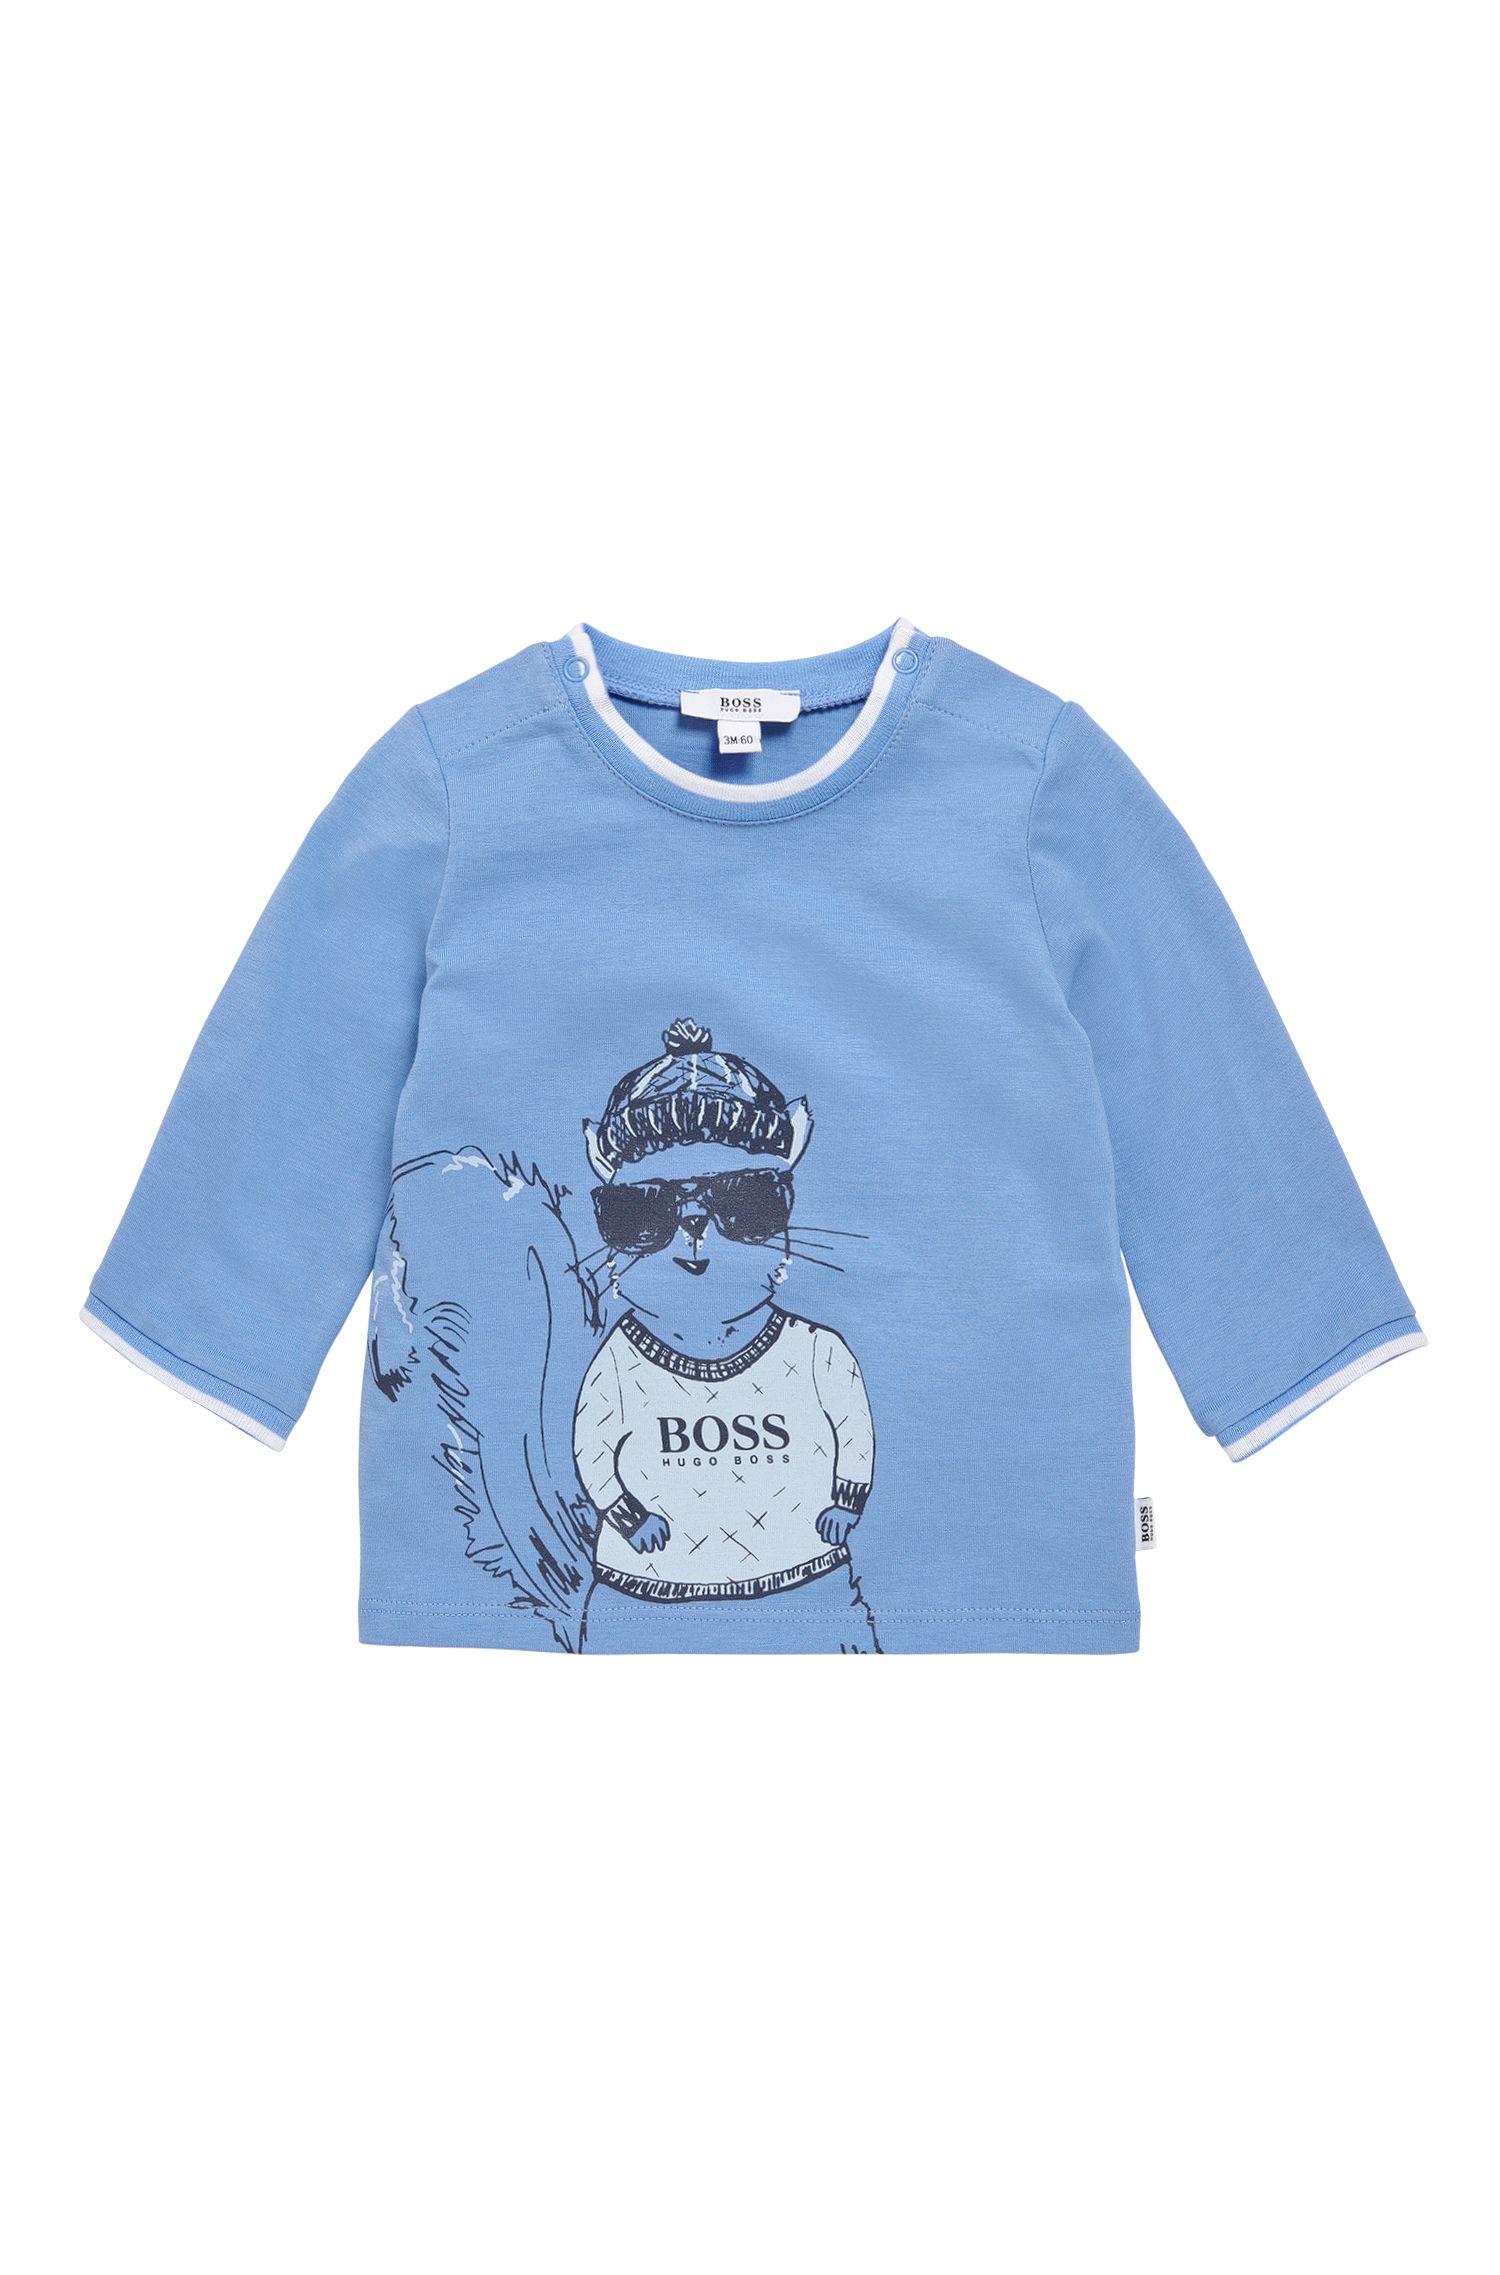 'J95208' | Newborn Stretch Cotton T-Shirt